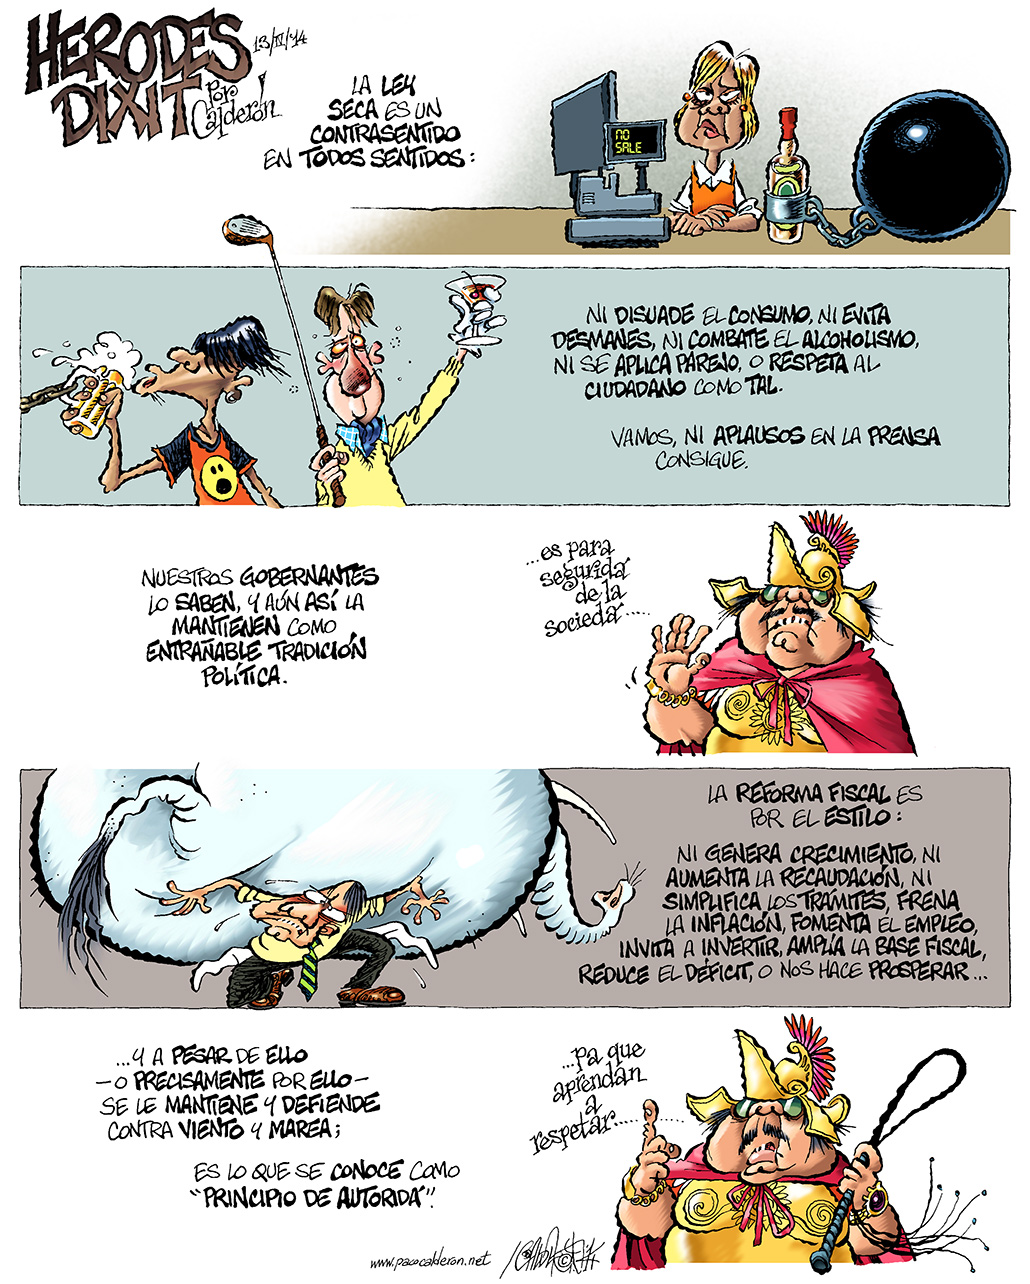 Herodes dixit - Calderón